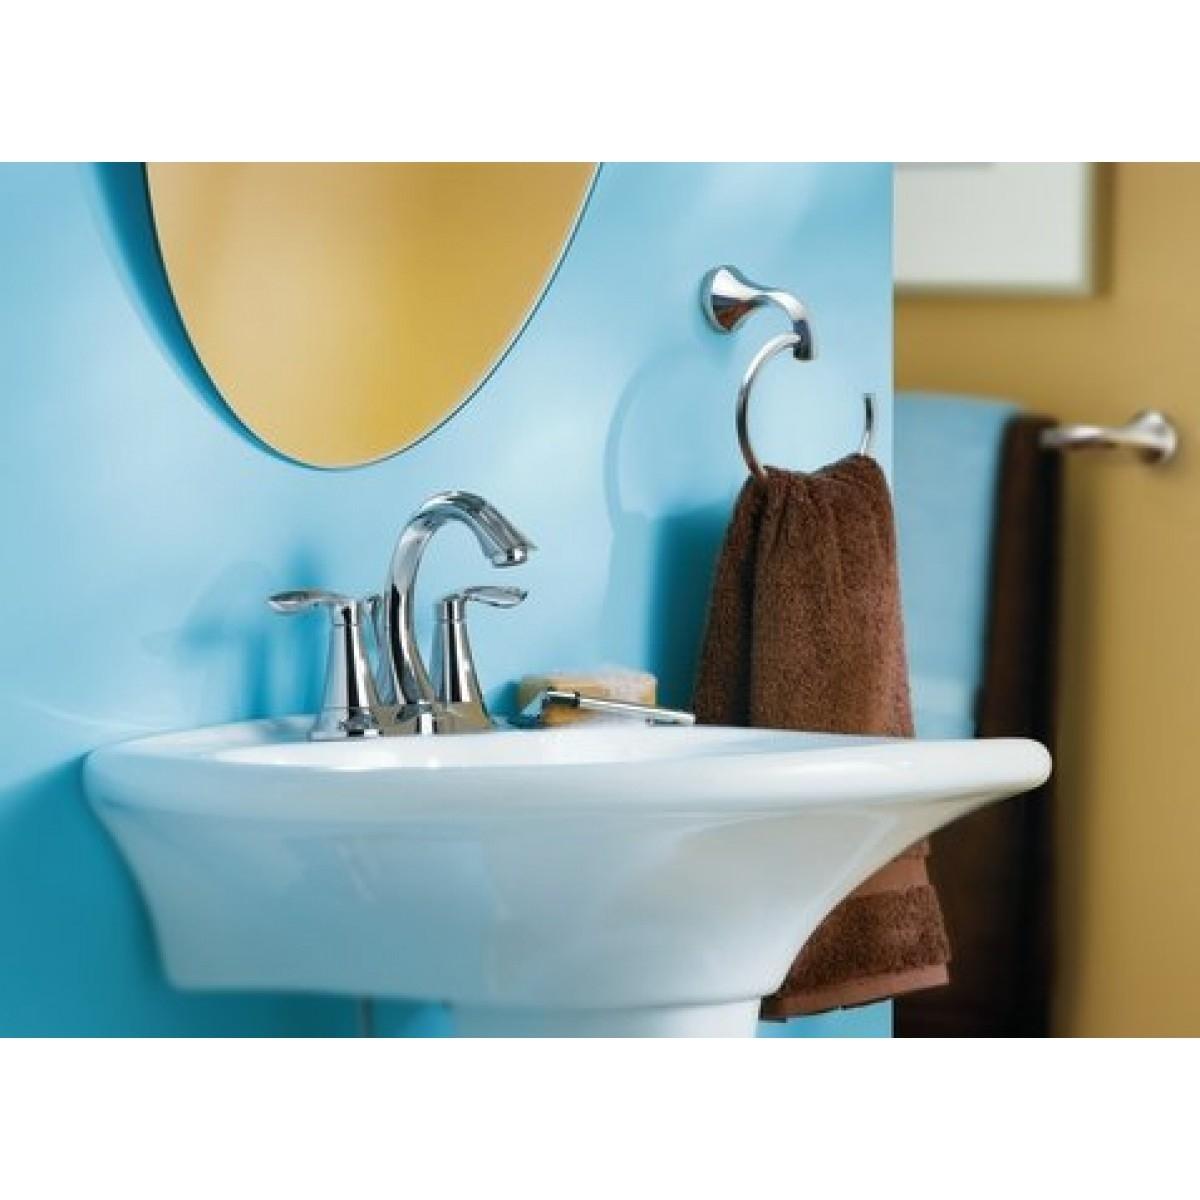 Ideas, moen eva centerset lead free 3 hole high arc bathroom faucet in size 1200 x 1200  .